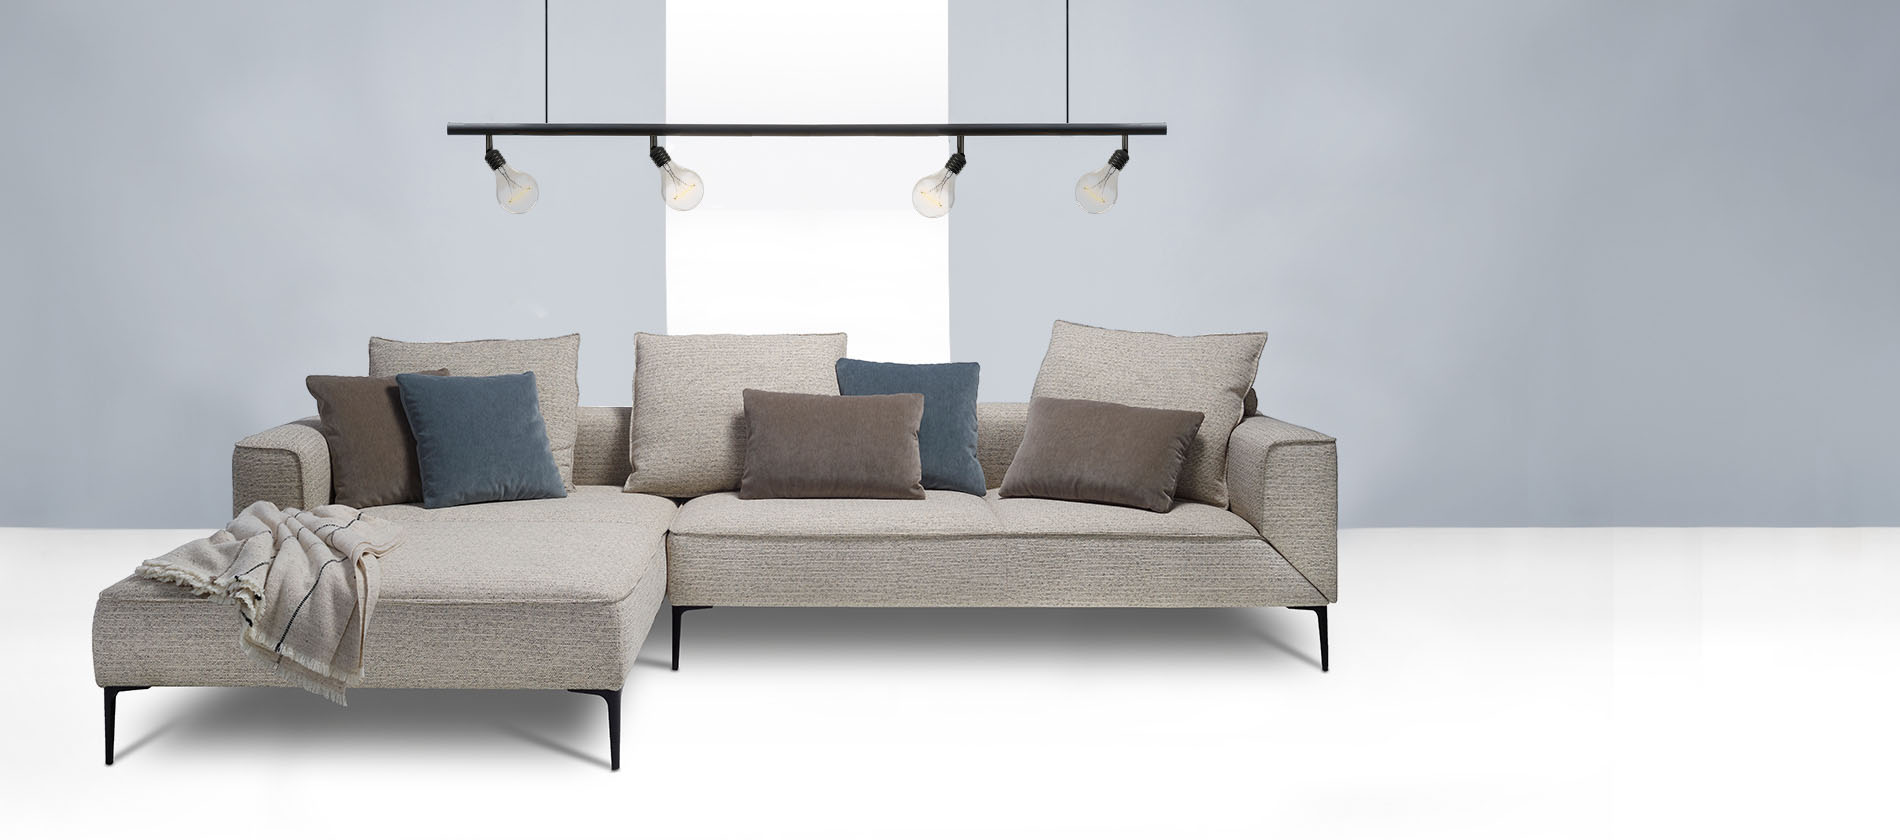 Sofa Longueville Landscape Von Jori Individuelles Designersofa